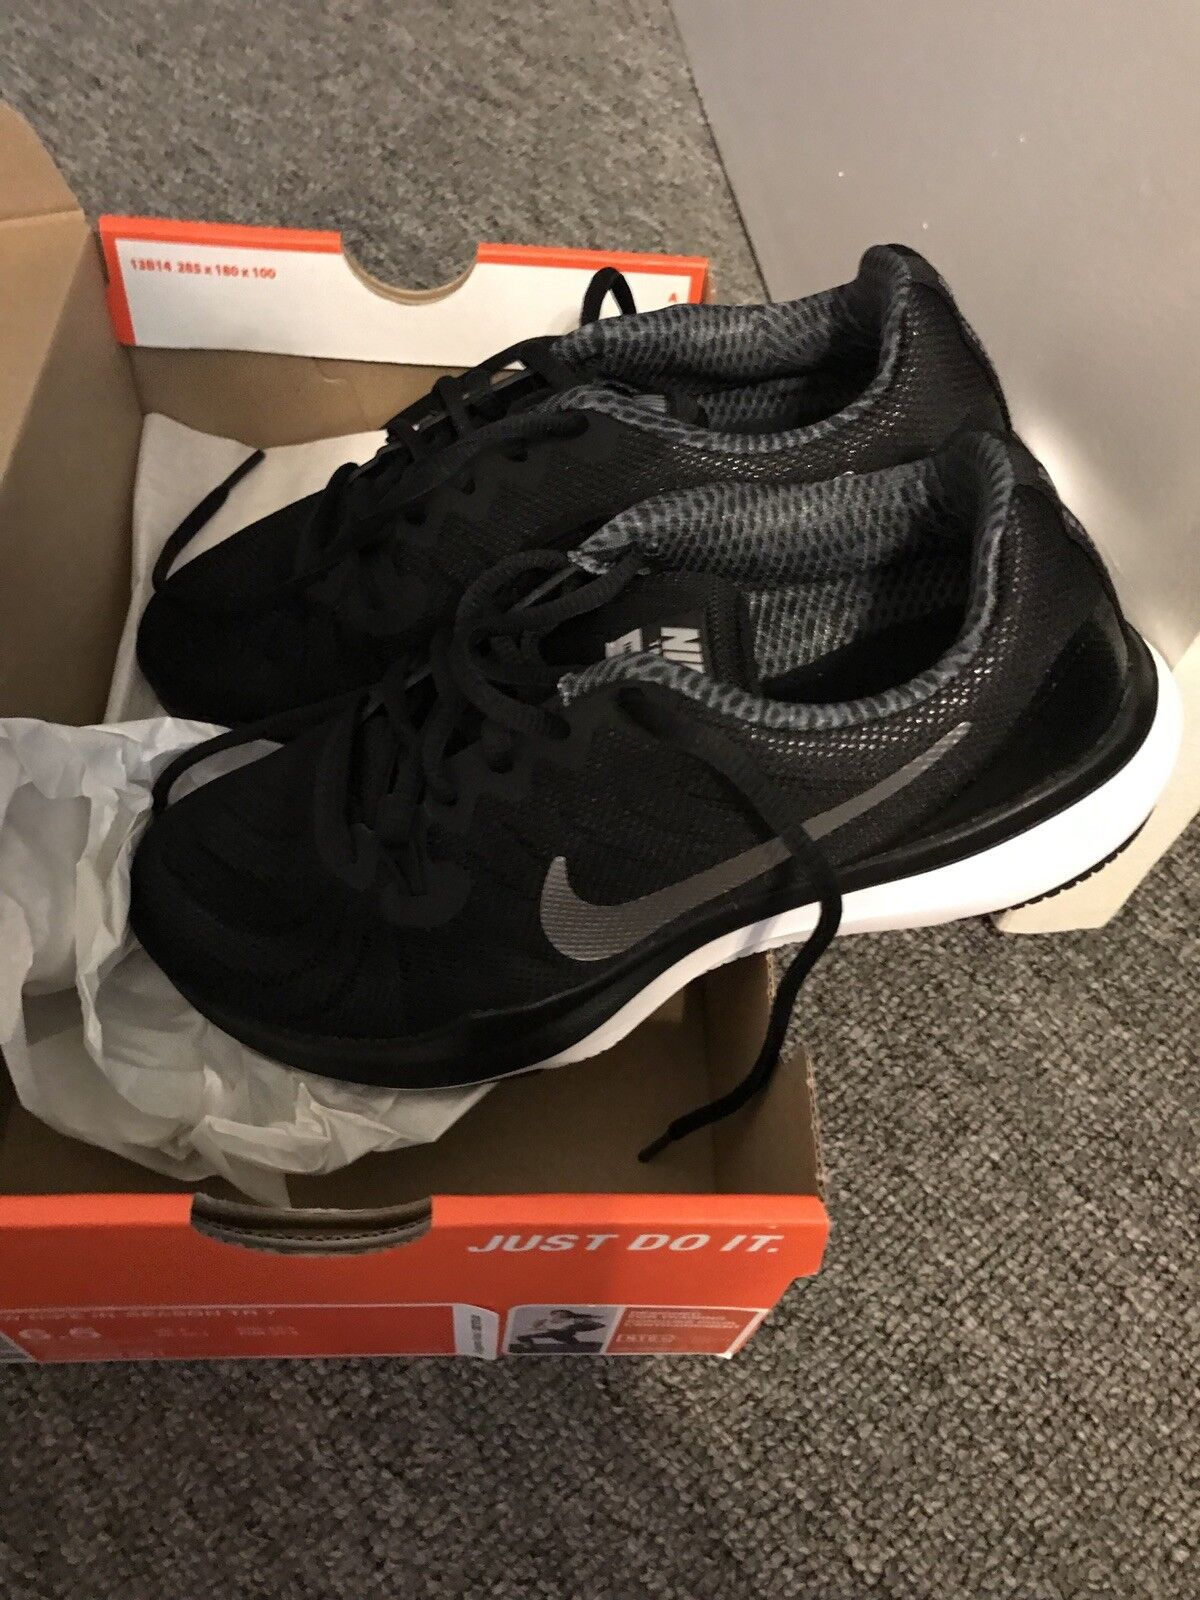 Women's Brand New Nike Air Sneakers 6.5